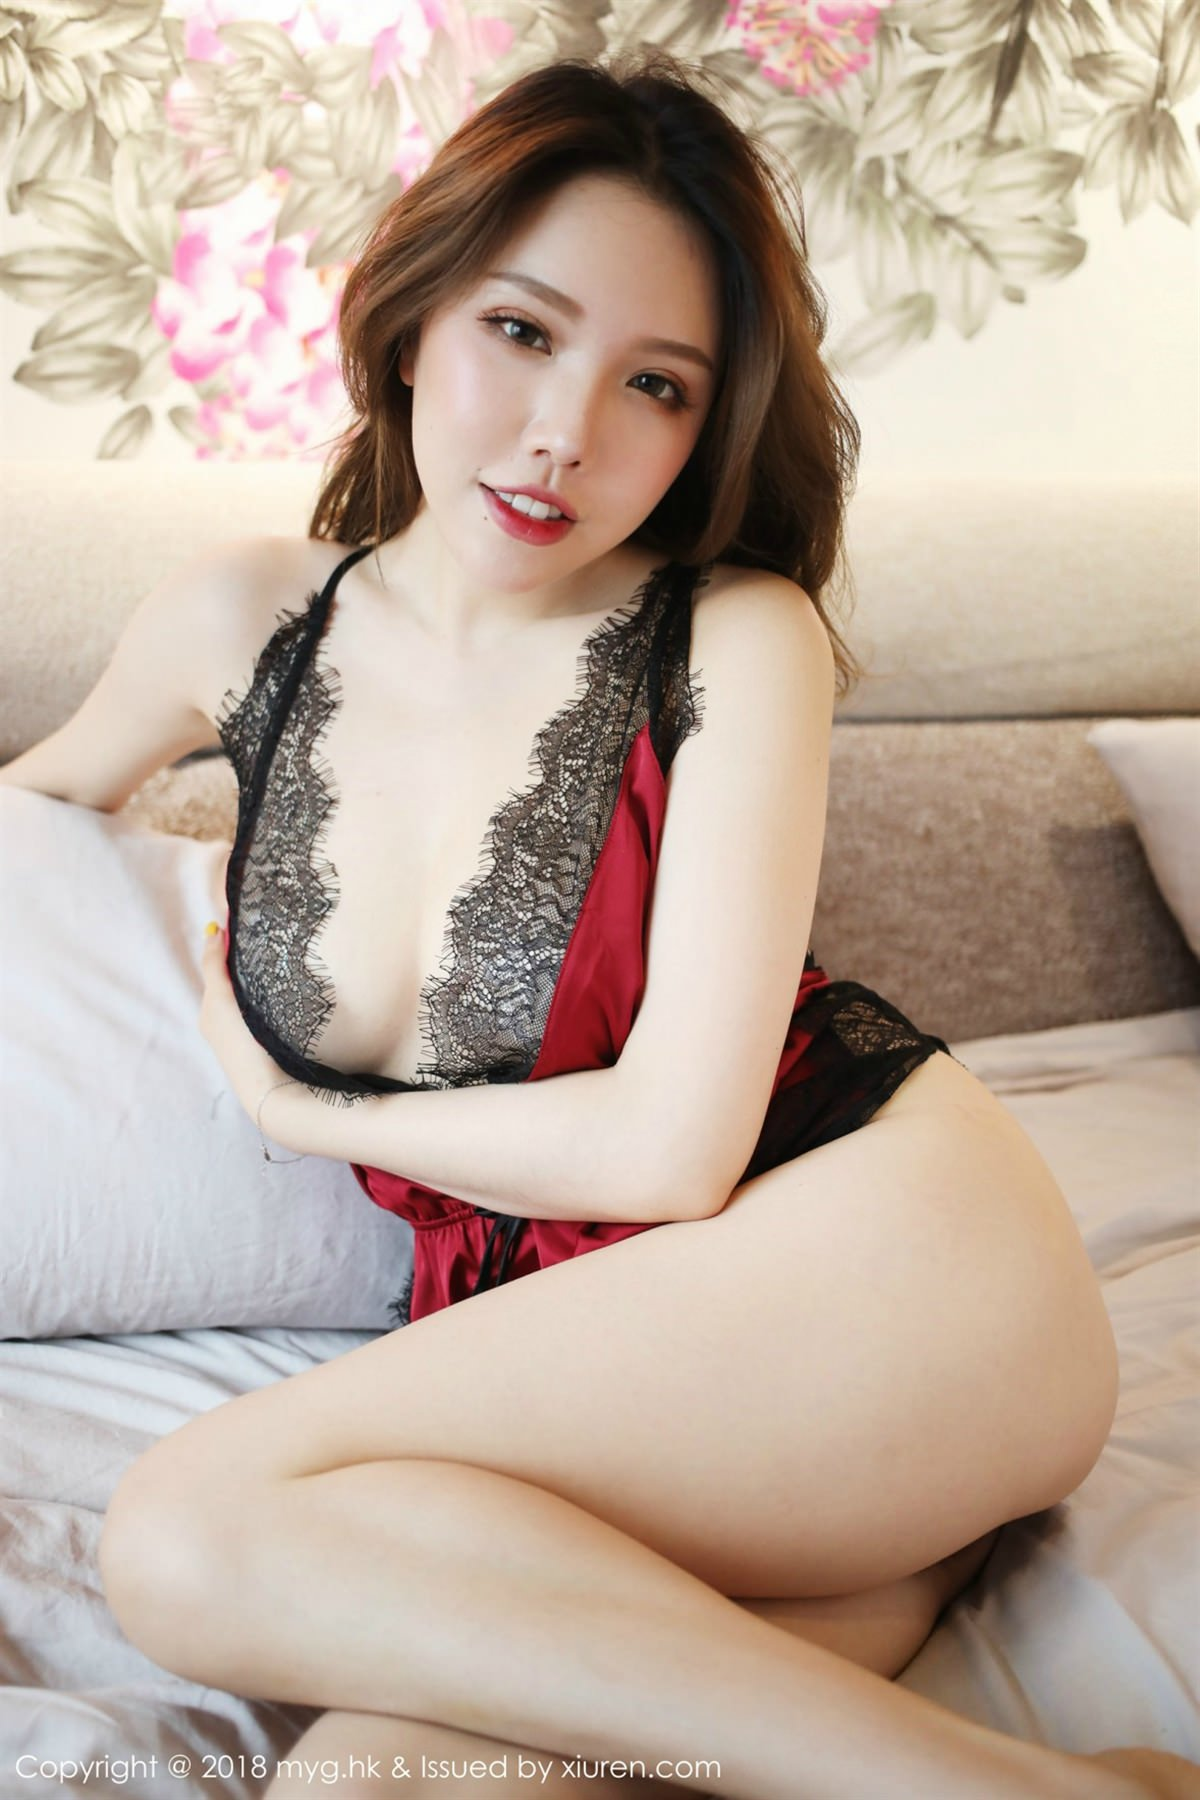 MyGirl Vol.292 67P, Huang Le Ran, mygirl